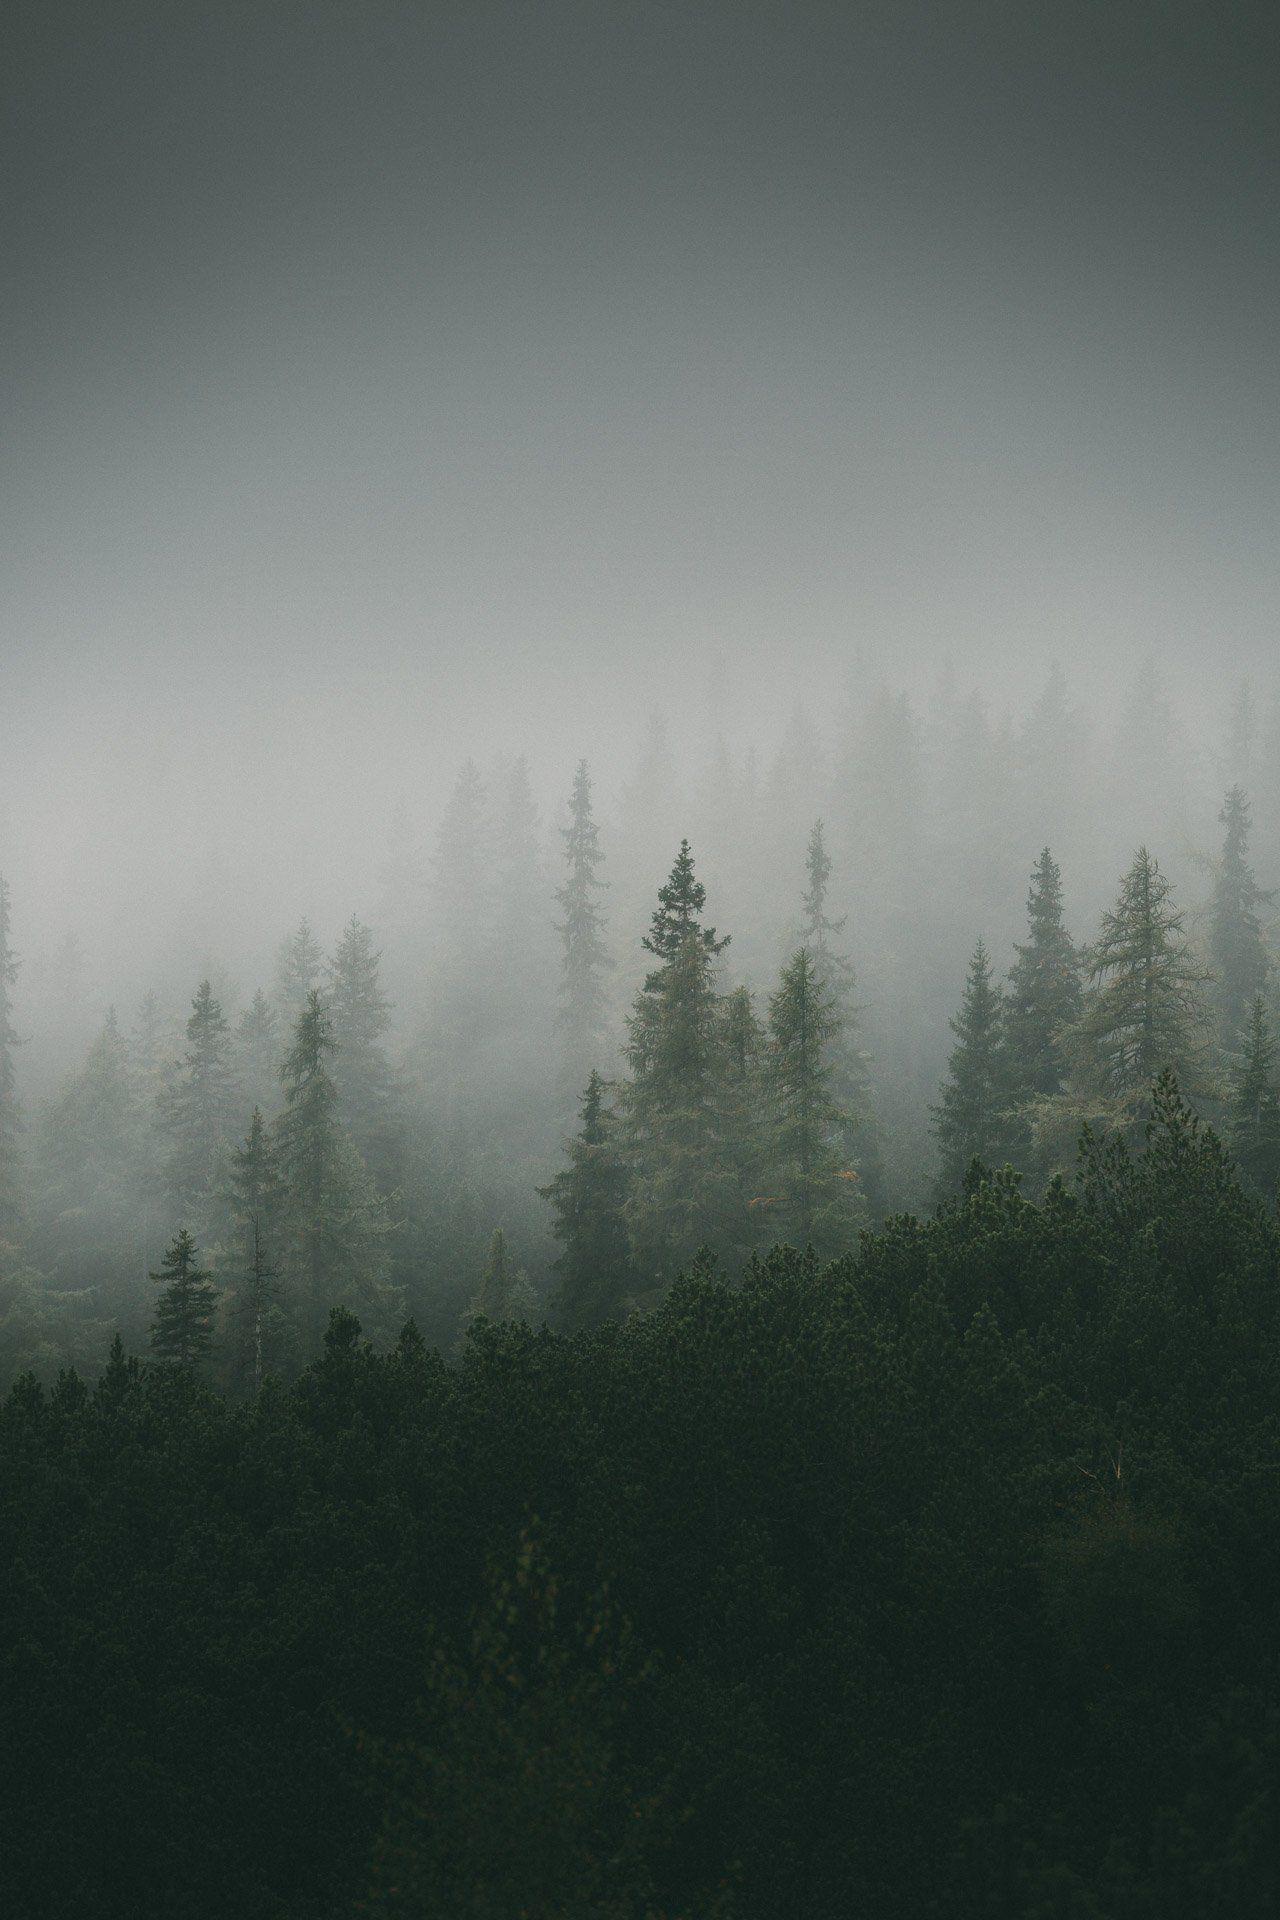 Fotografieren bei schlechtem Wetter: 7 Ideen für